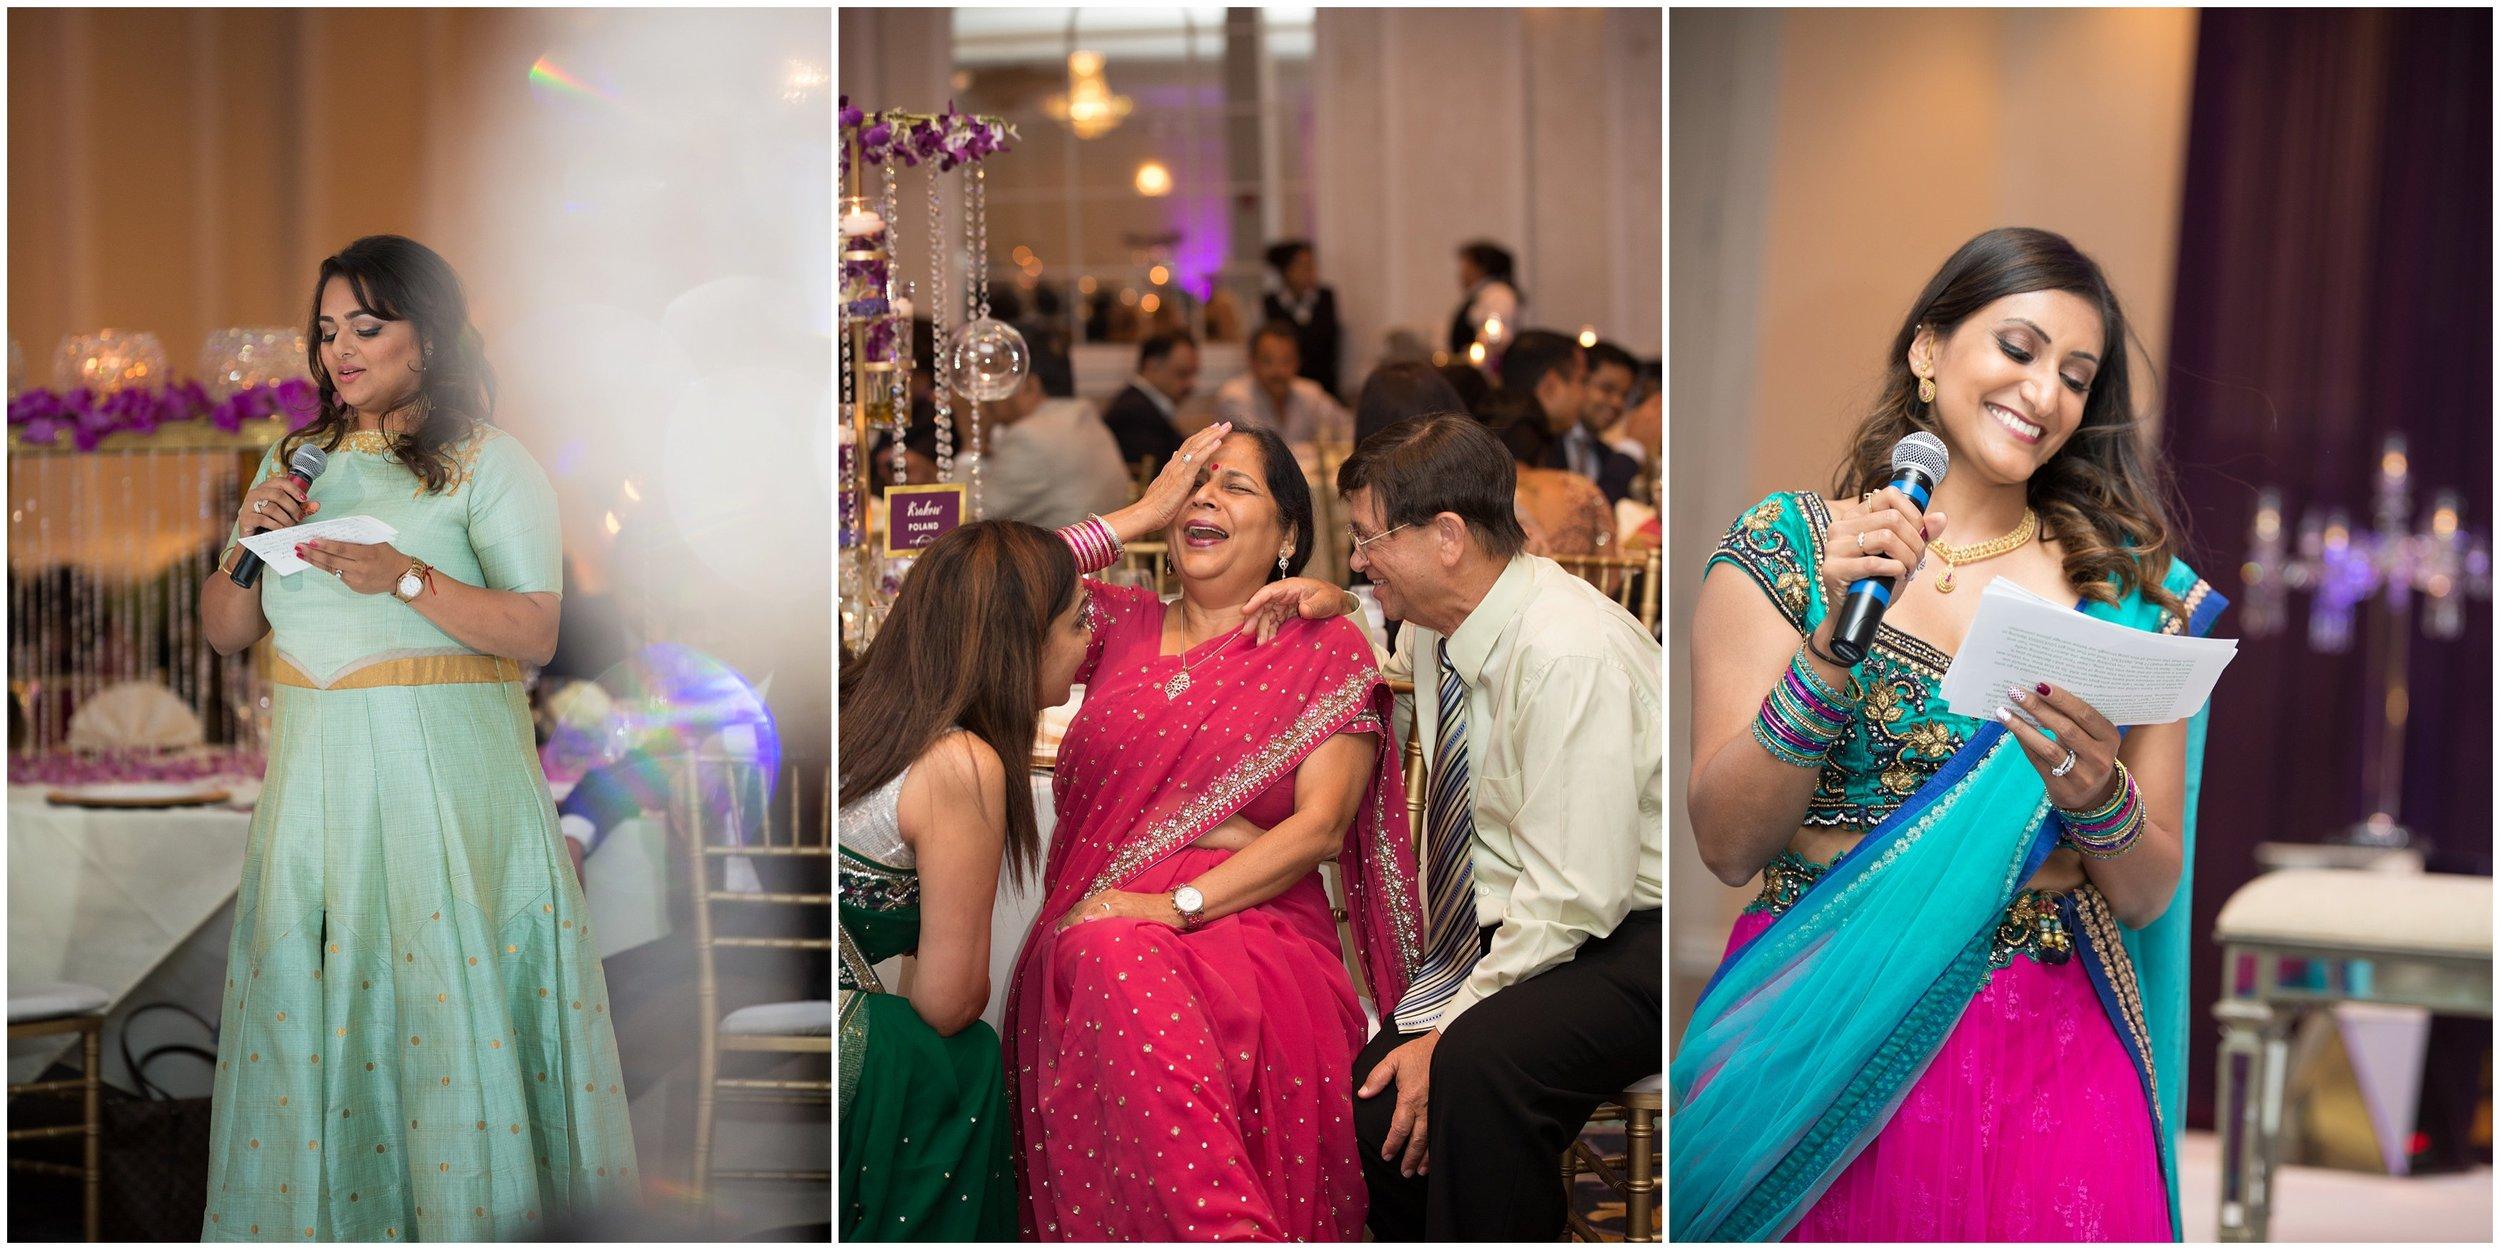 Le Cape Weddings - South Asian Wedding in Illinois - Tanvi and Anshul -1270_LuxuryDestinationPhotographer.jpg